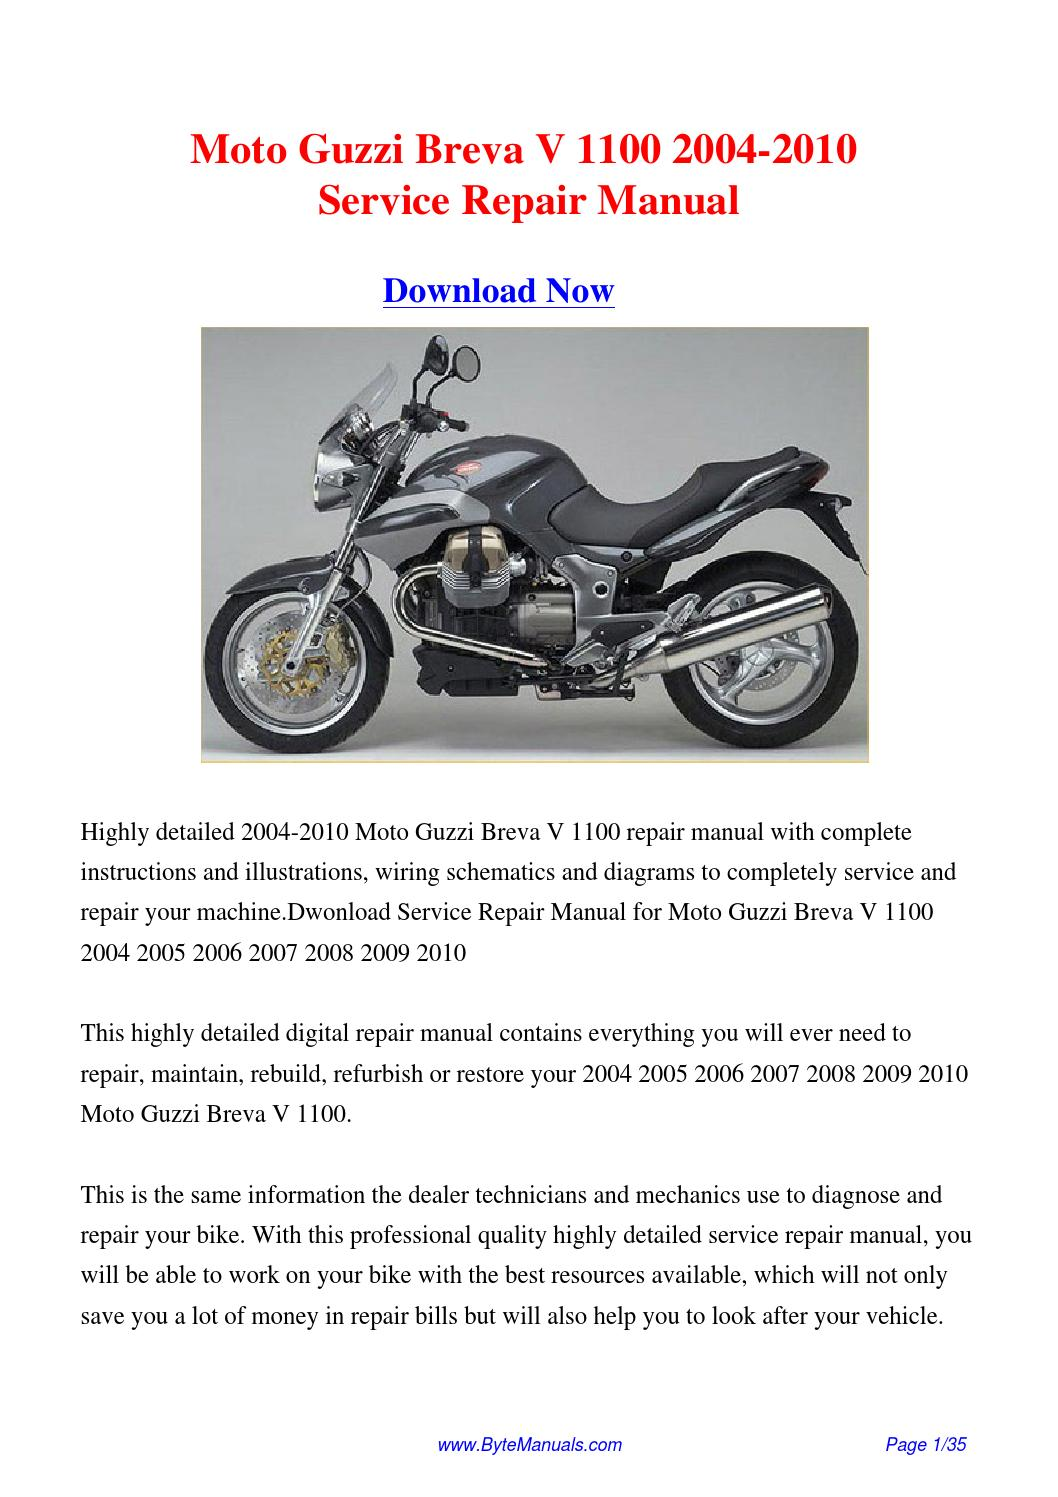 2004 moto guzzi breva 750 owners manual pdf